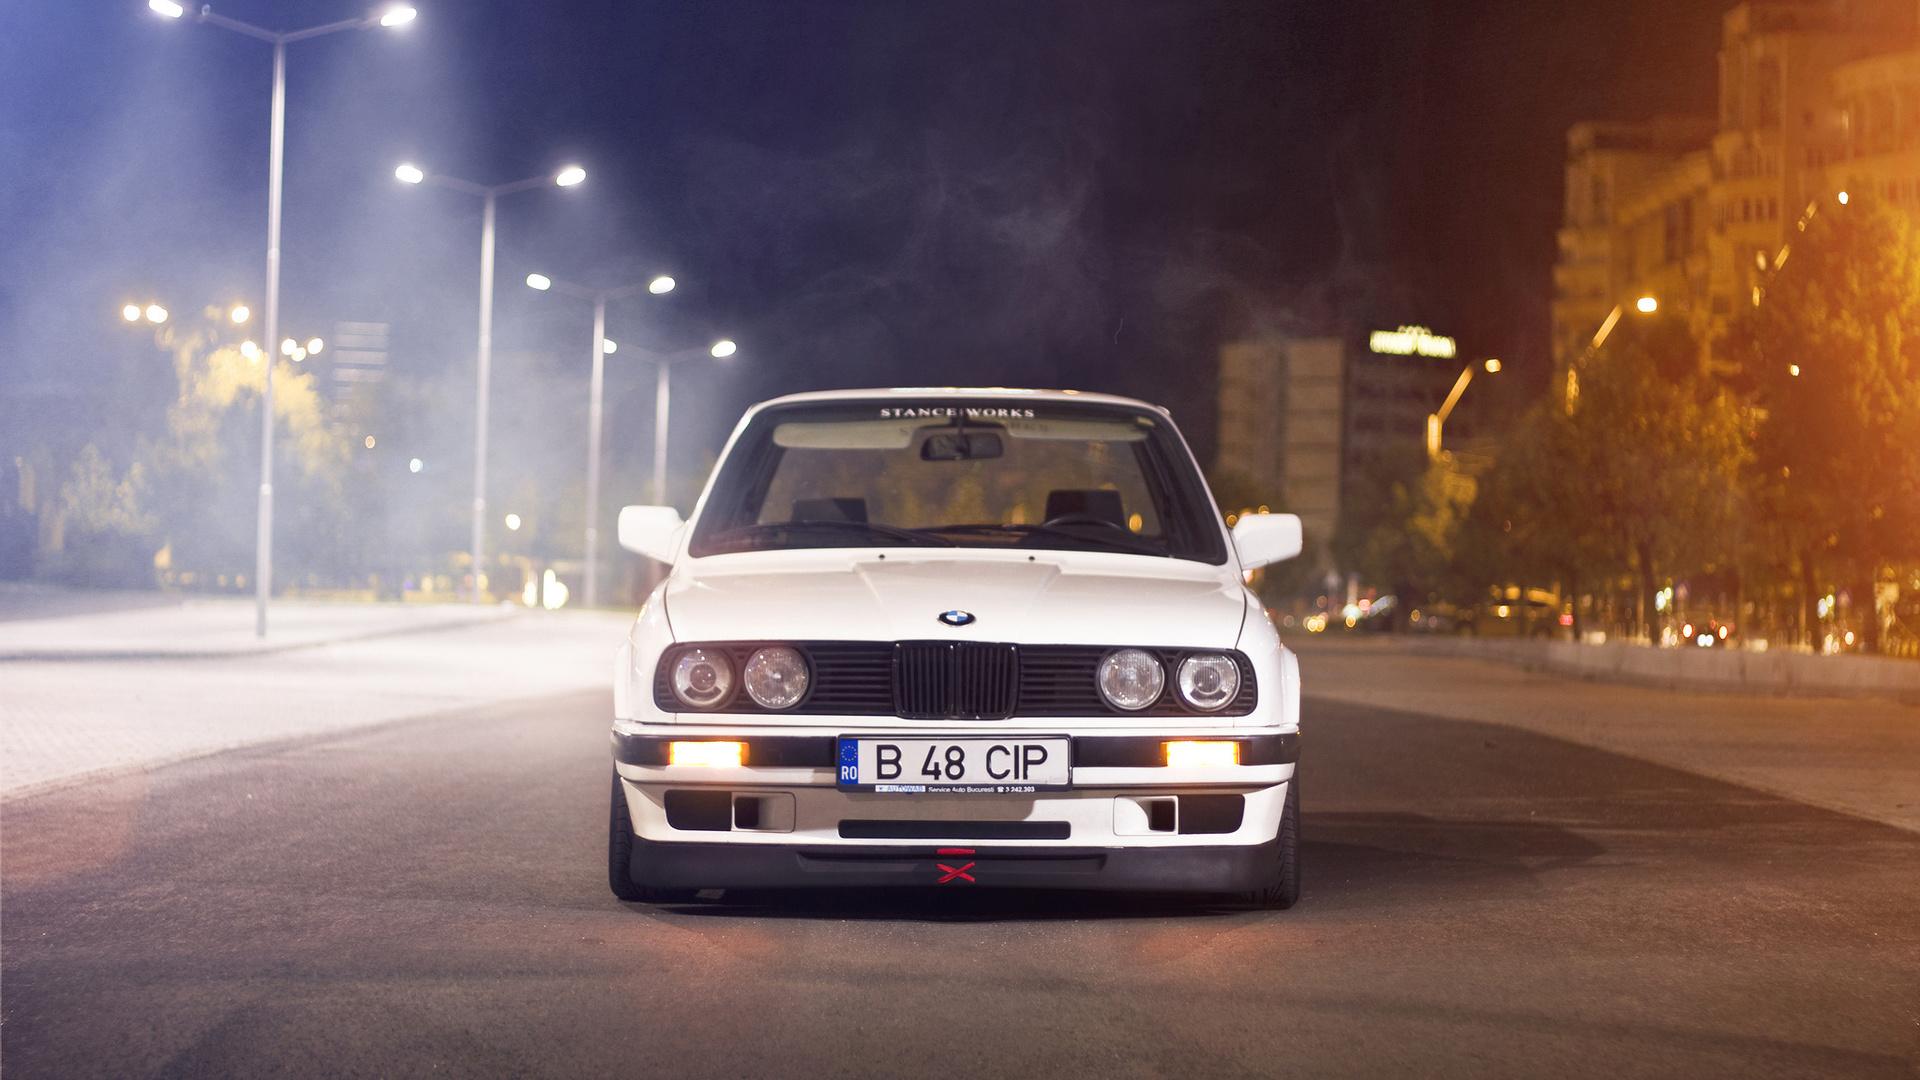 белый, e30, улица, блик, бмв, white, sedan, Bmw, 3 series, ночь